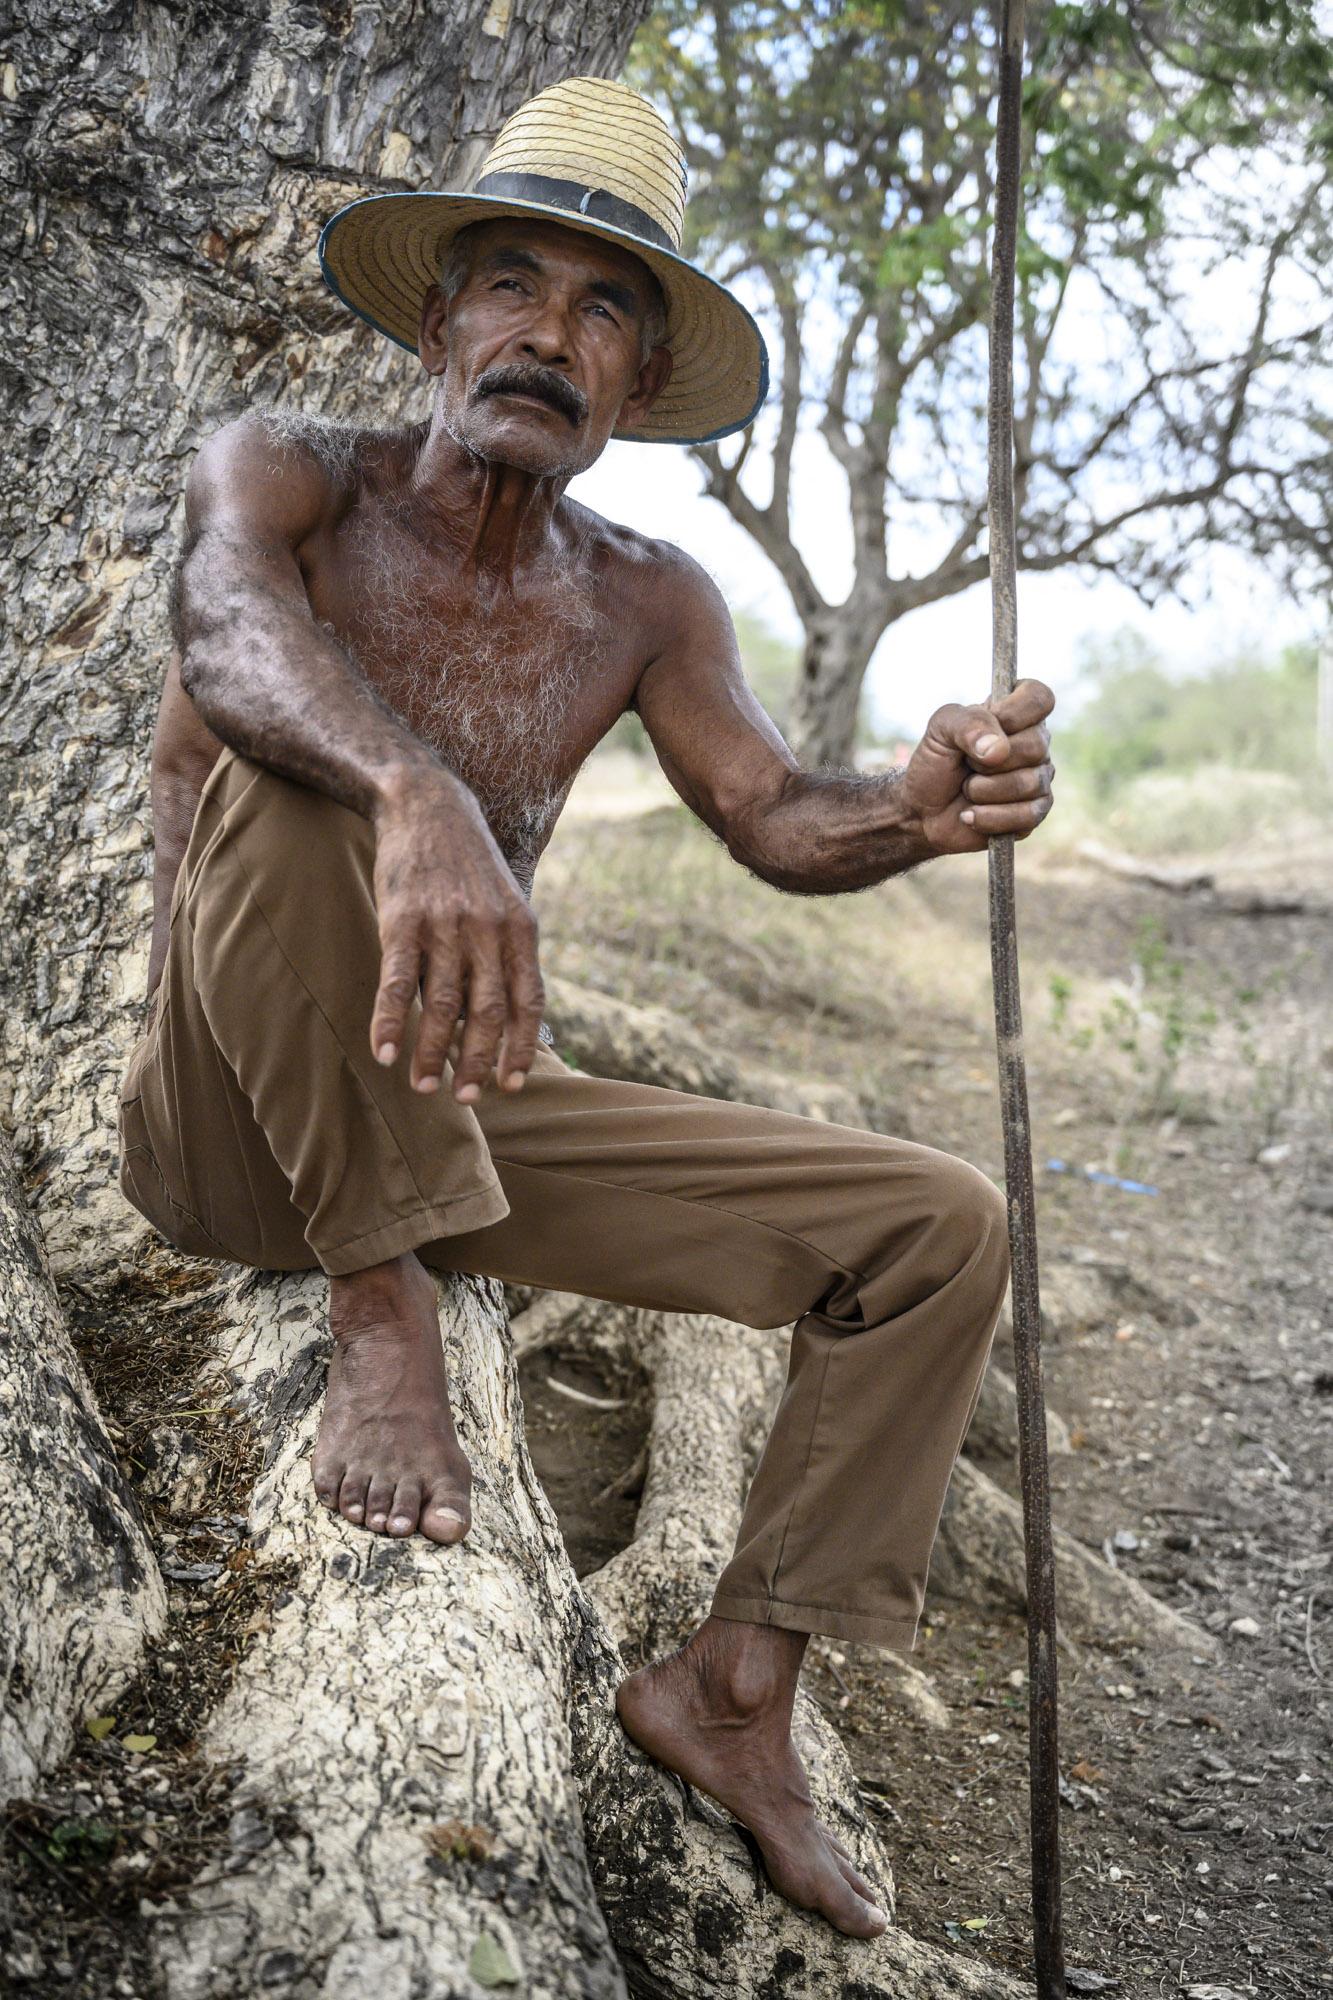 Jiguaní - Cuba - Hector Garrido, Aerial and human photography